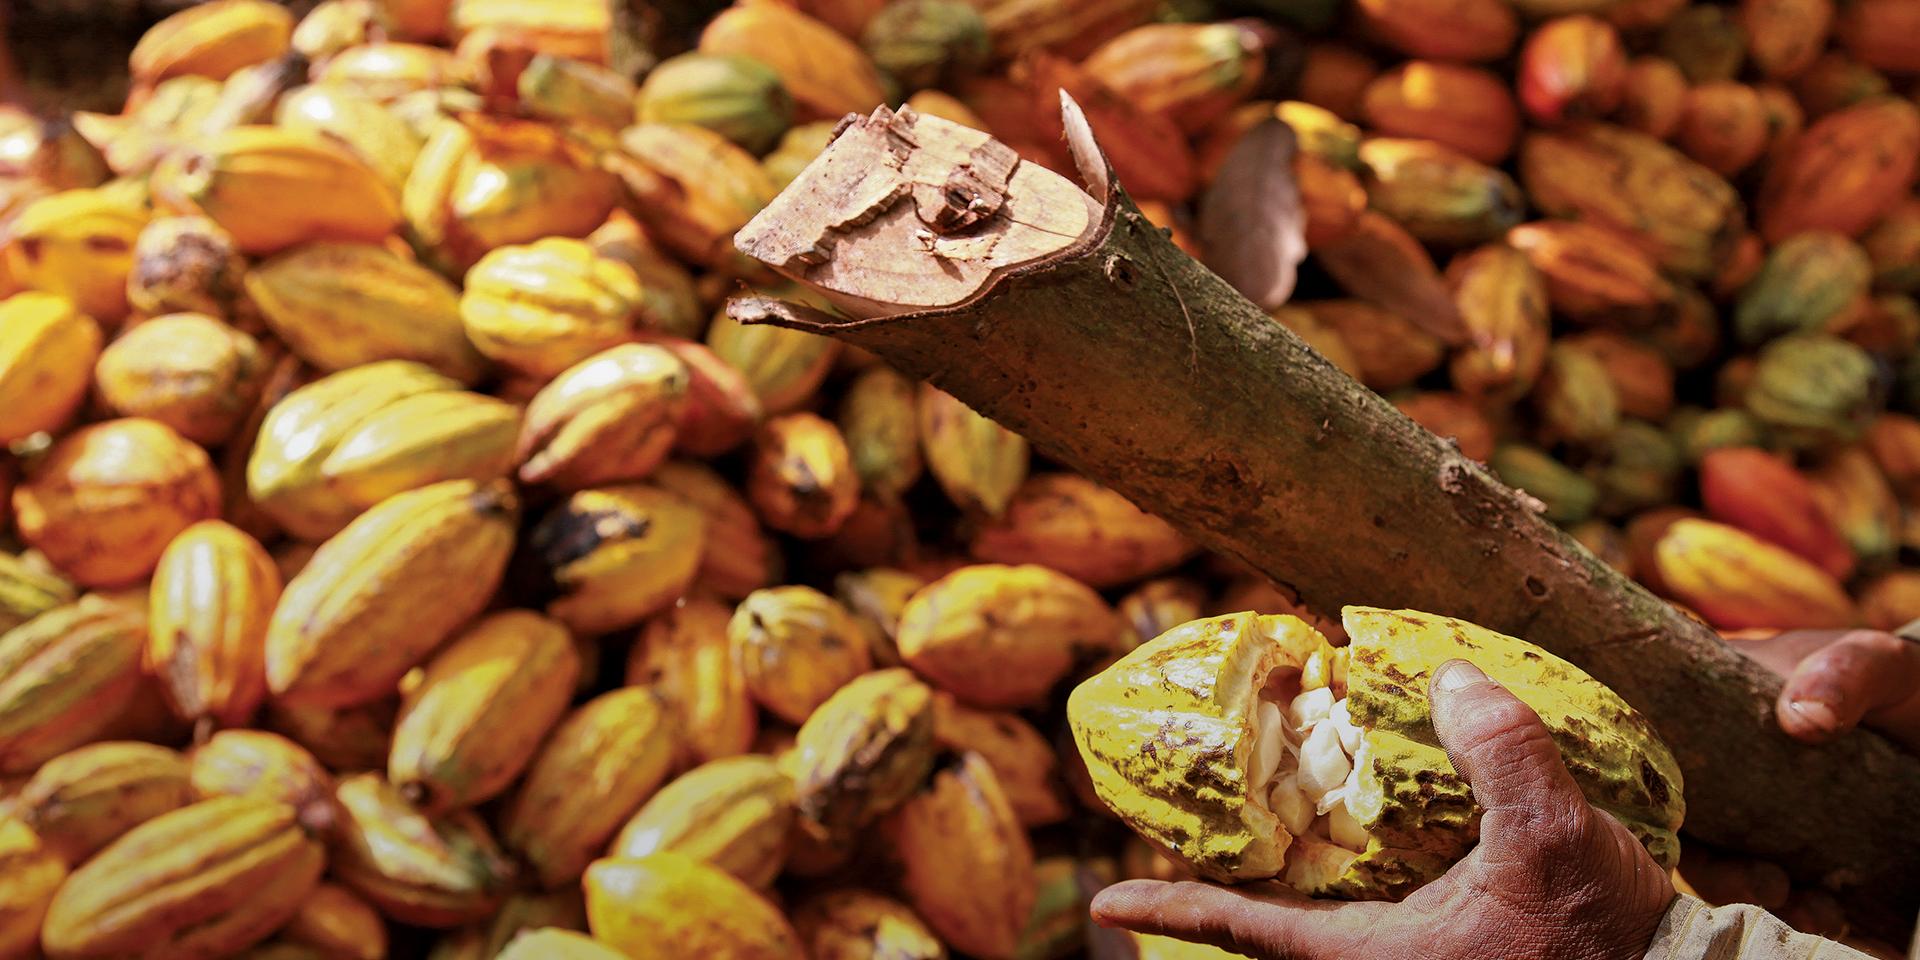 MARKETS II Cocoa Pods